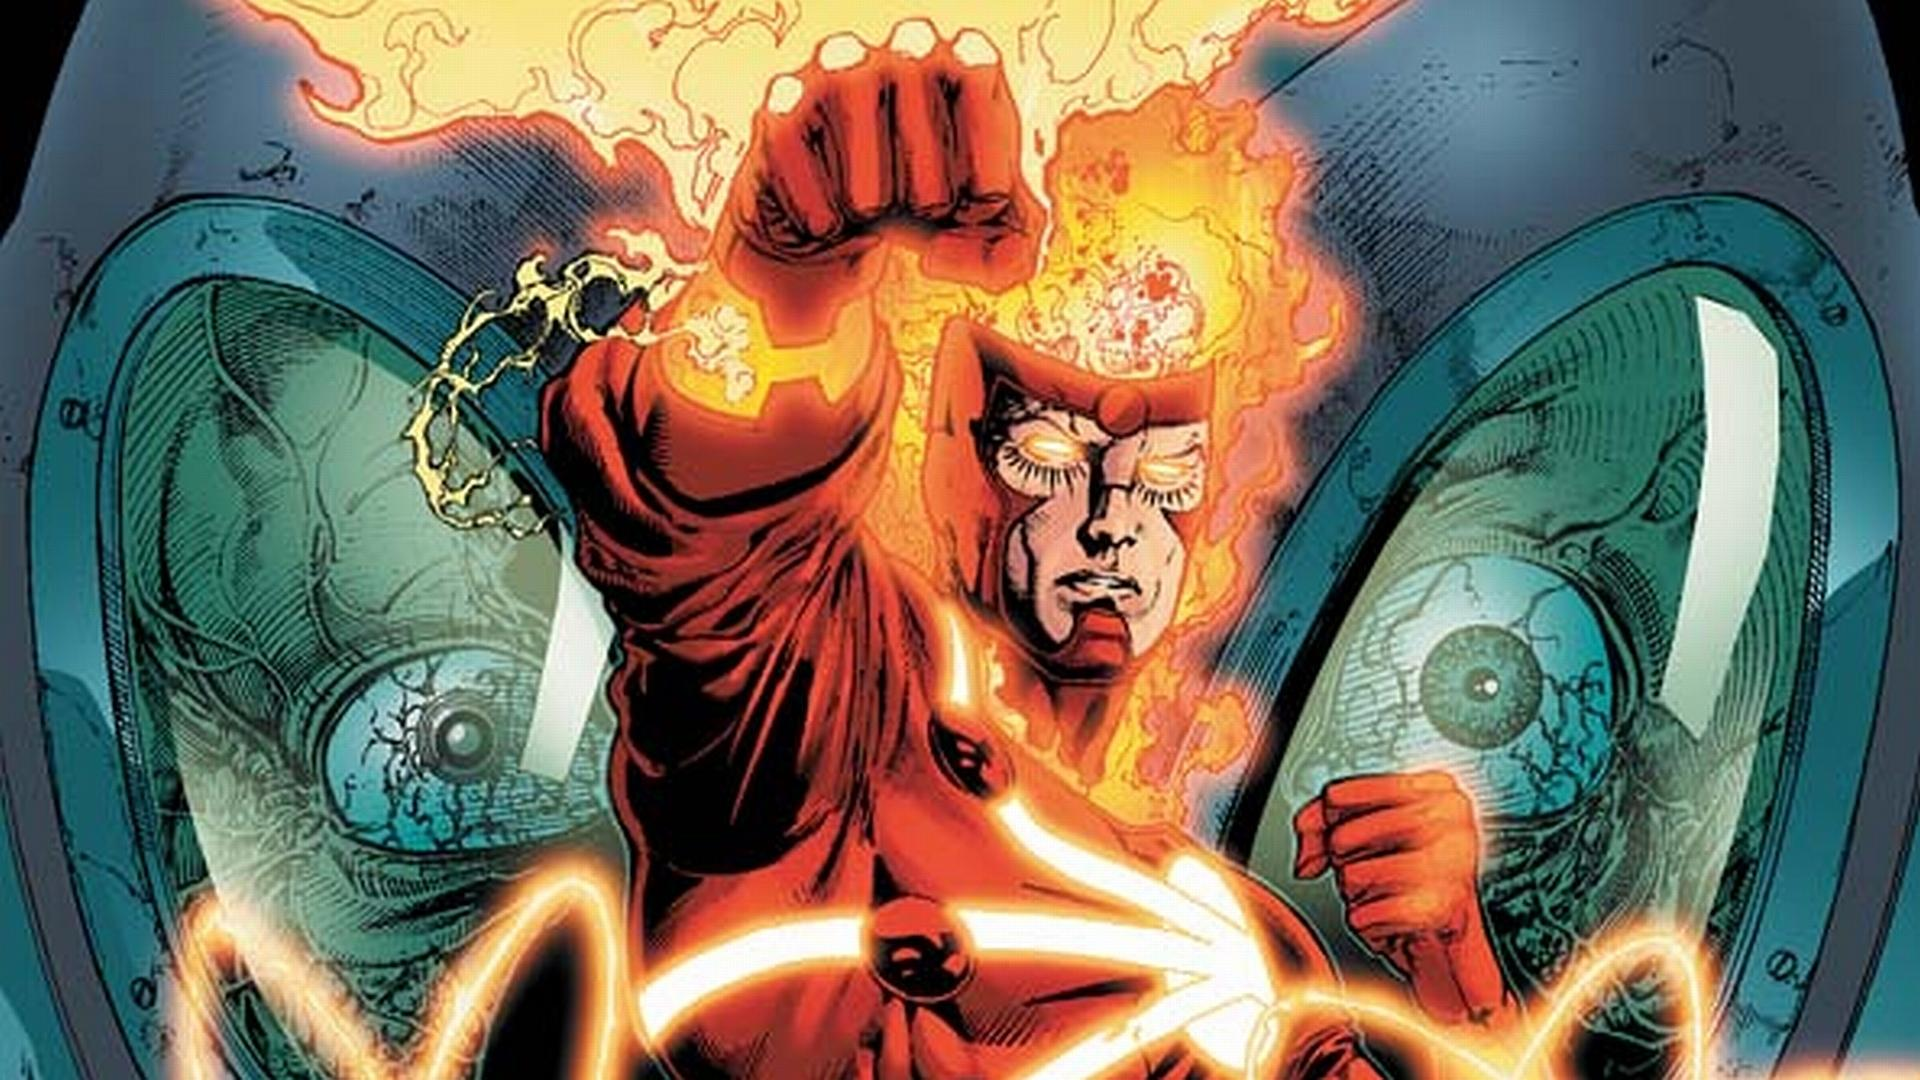 Firestorm Comics wallpapers HD quality